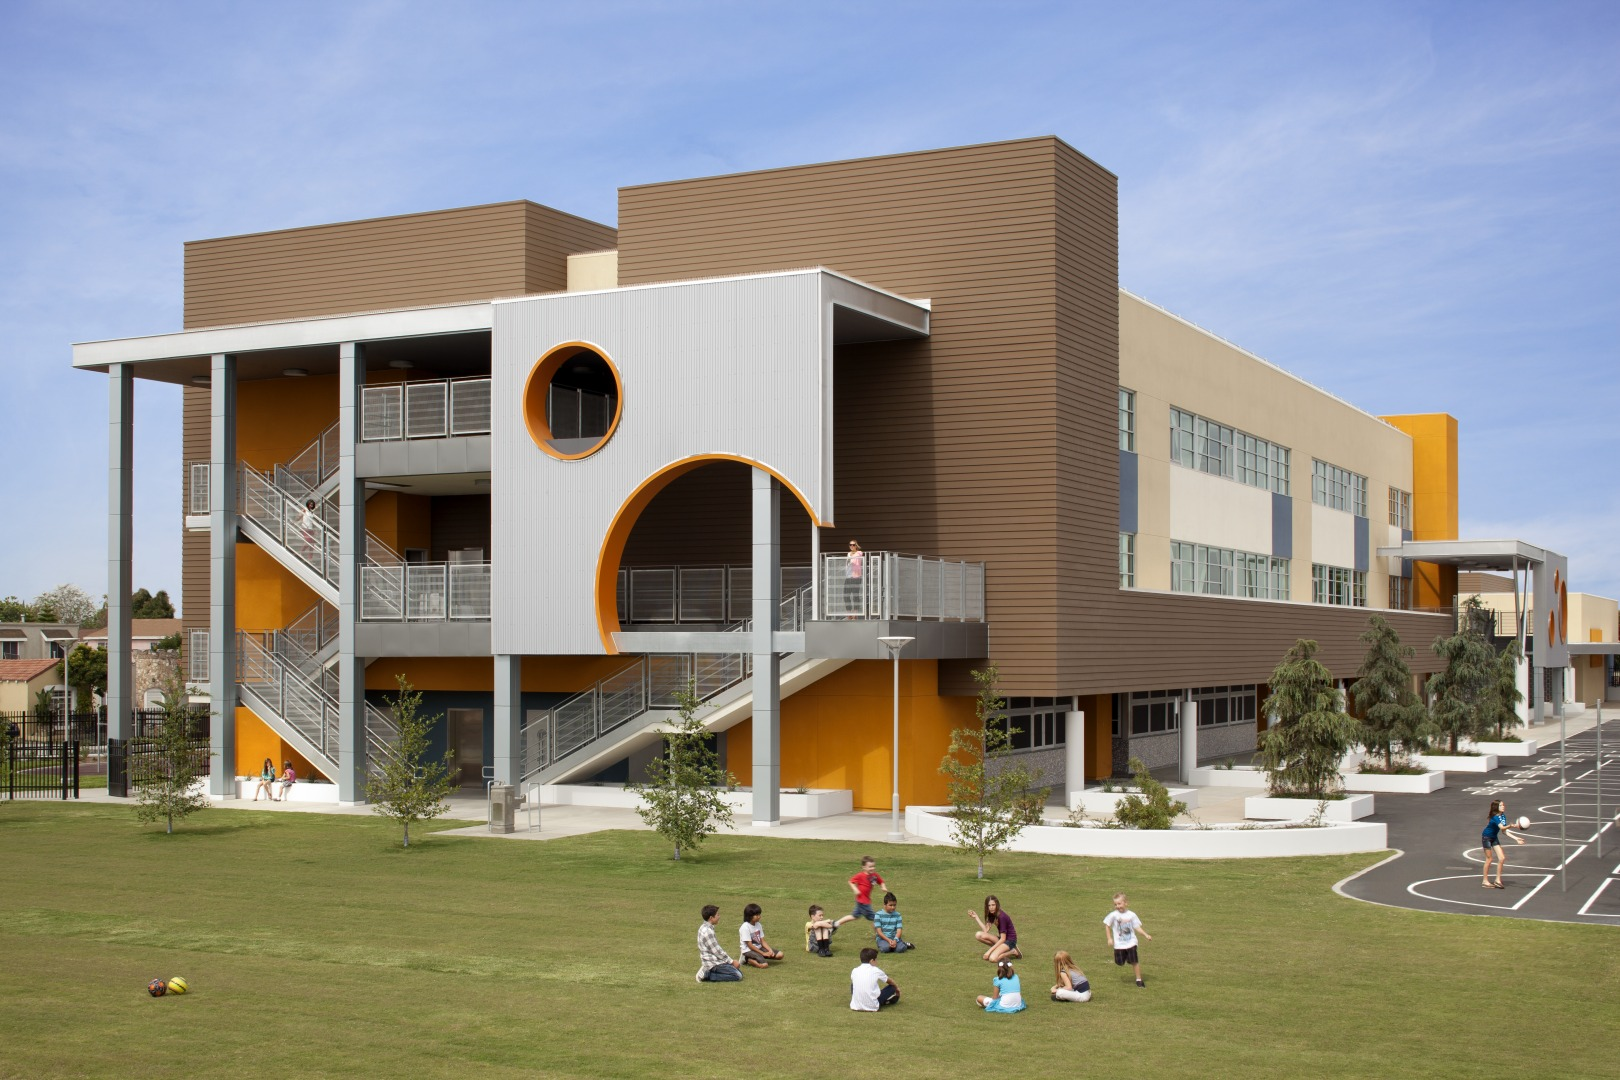 K 12 School Architecture Designs